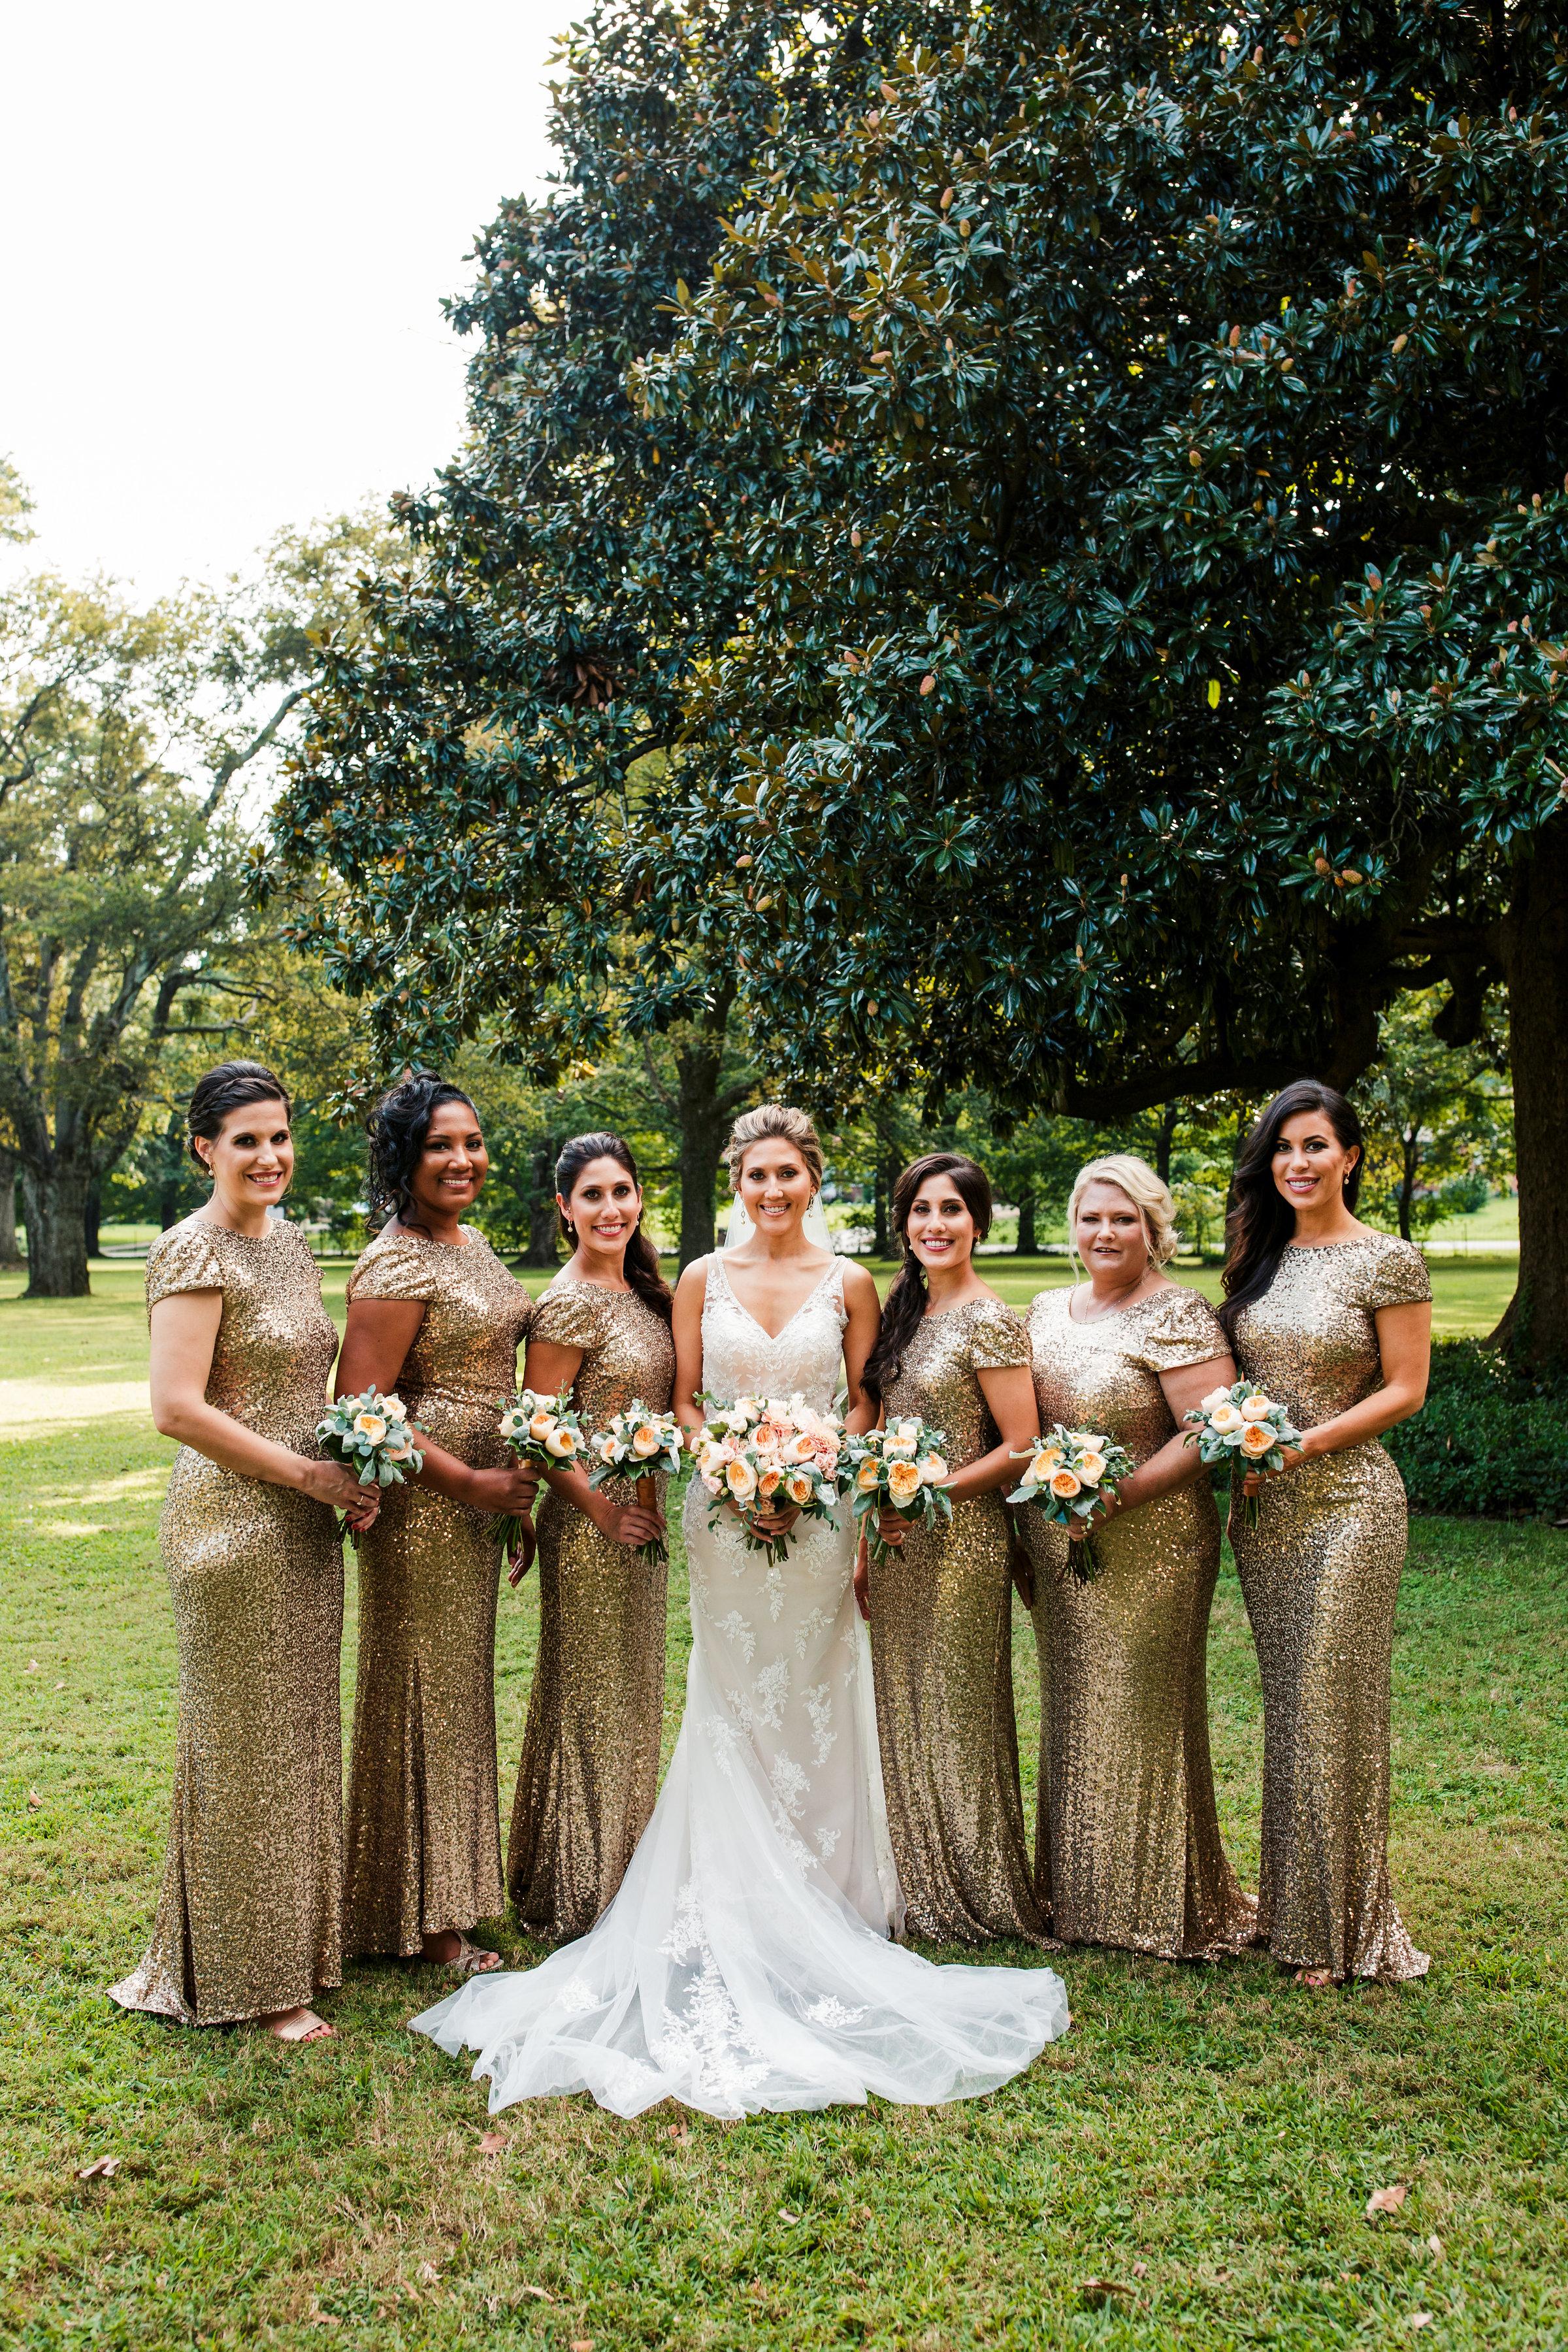 Riverwood-Mansion-Wedding9.jpg